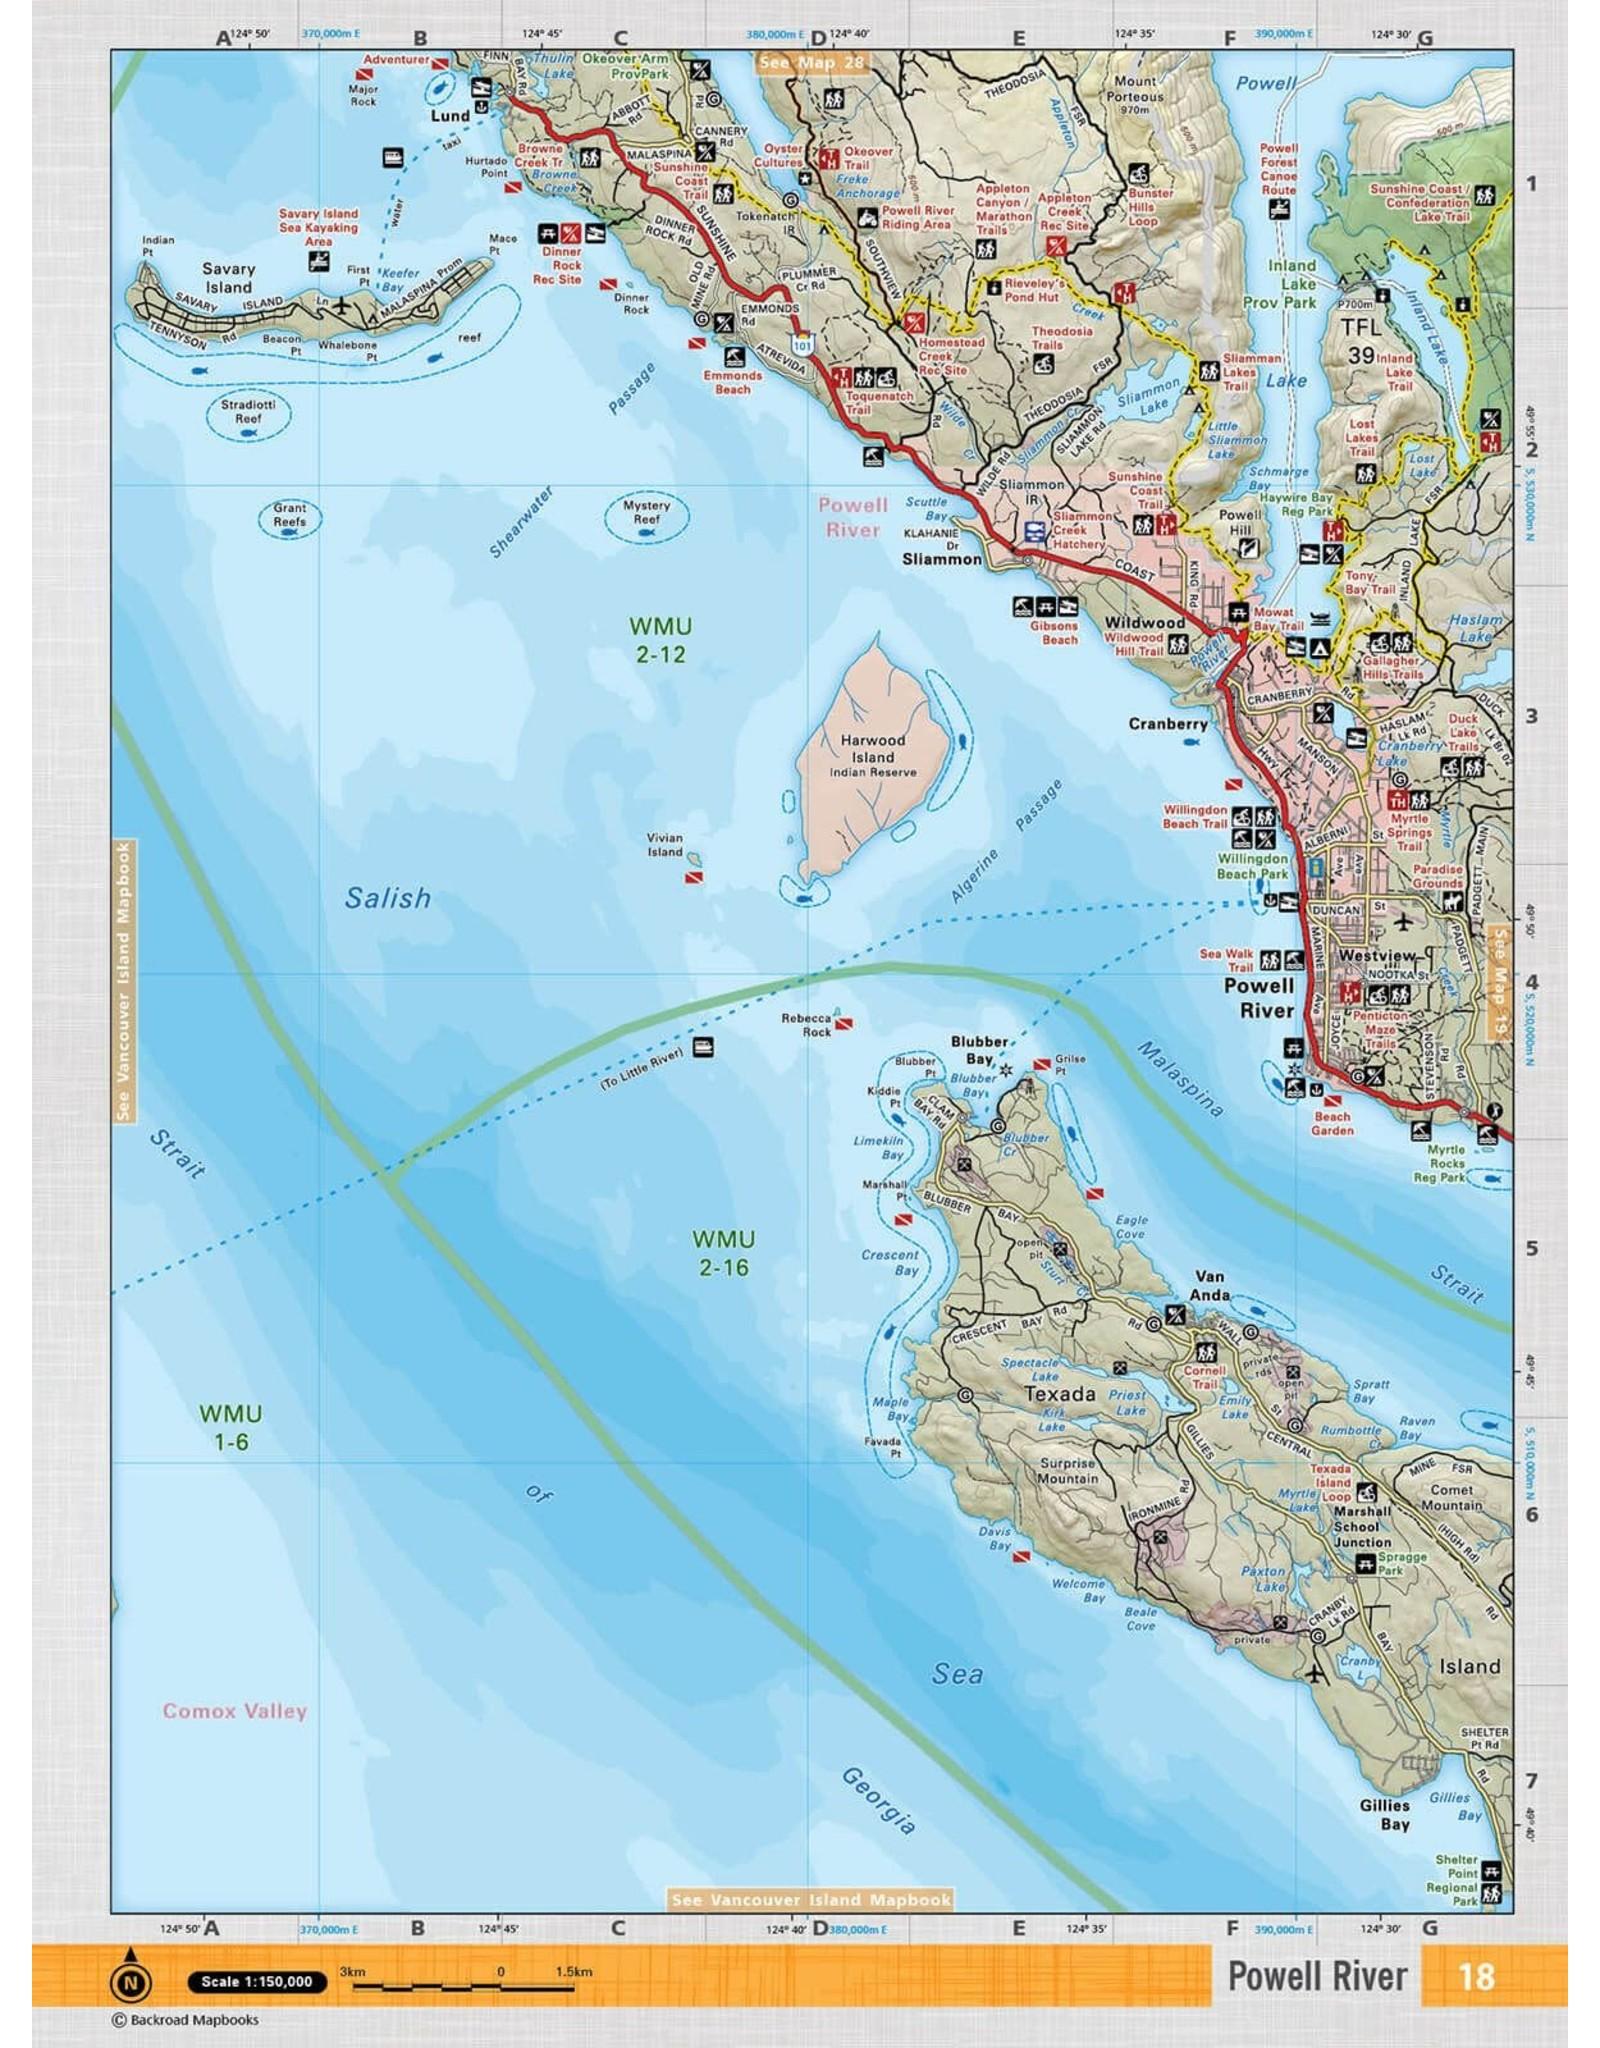 BRMB - TOPO MAP (VCBC 18- POWELL RIVER)